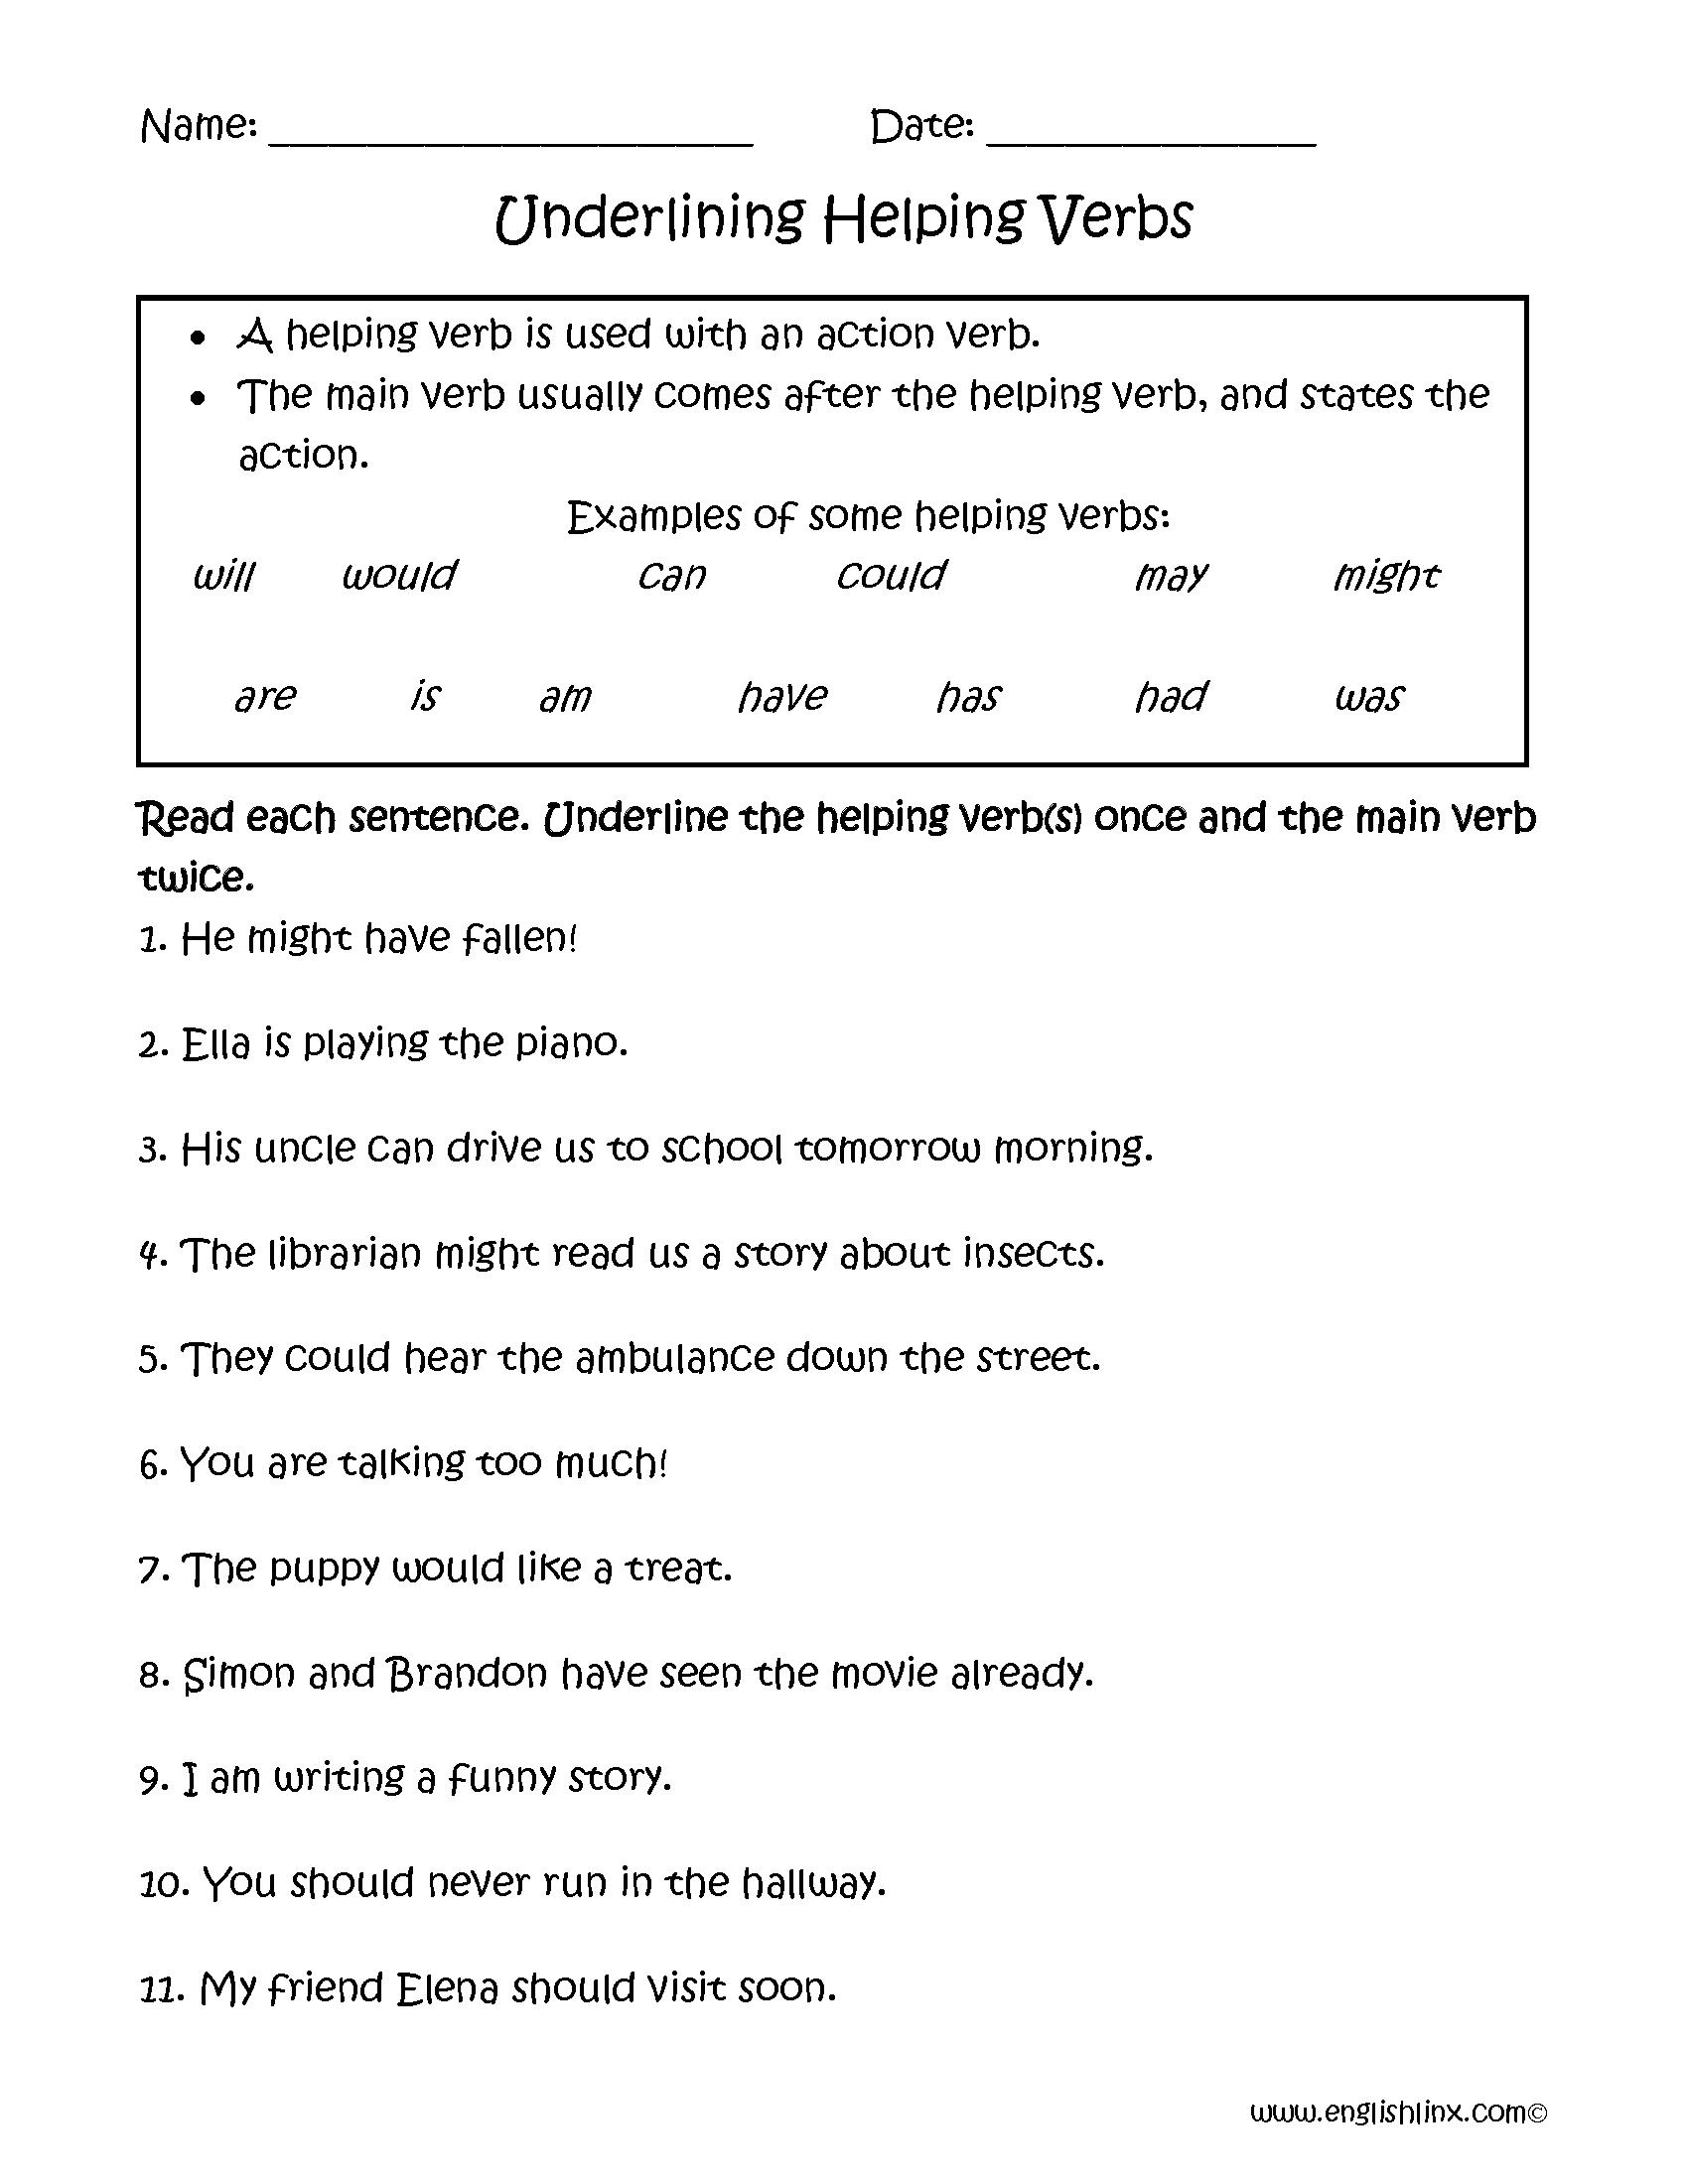 medium resolution of Underlining Helping Verbs Worksheets   Helping verbs